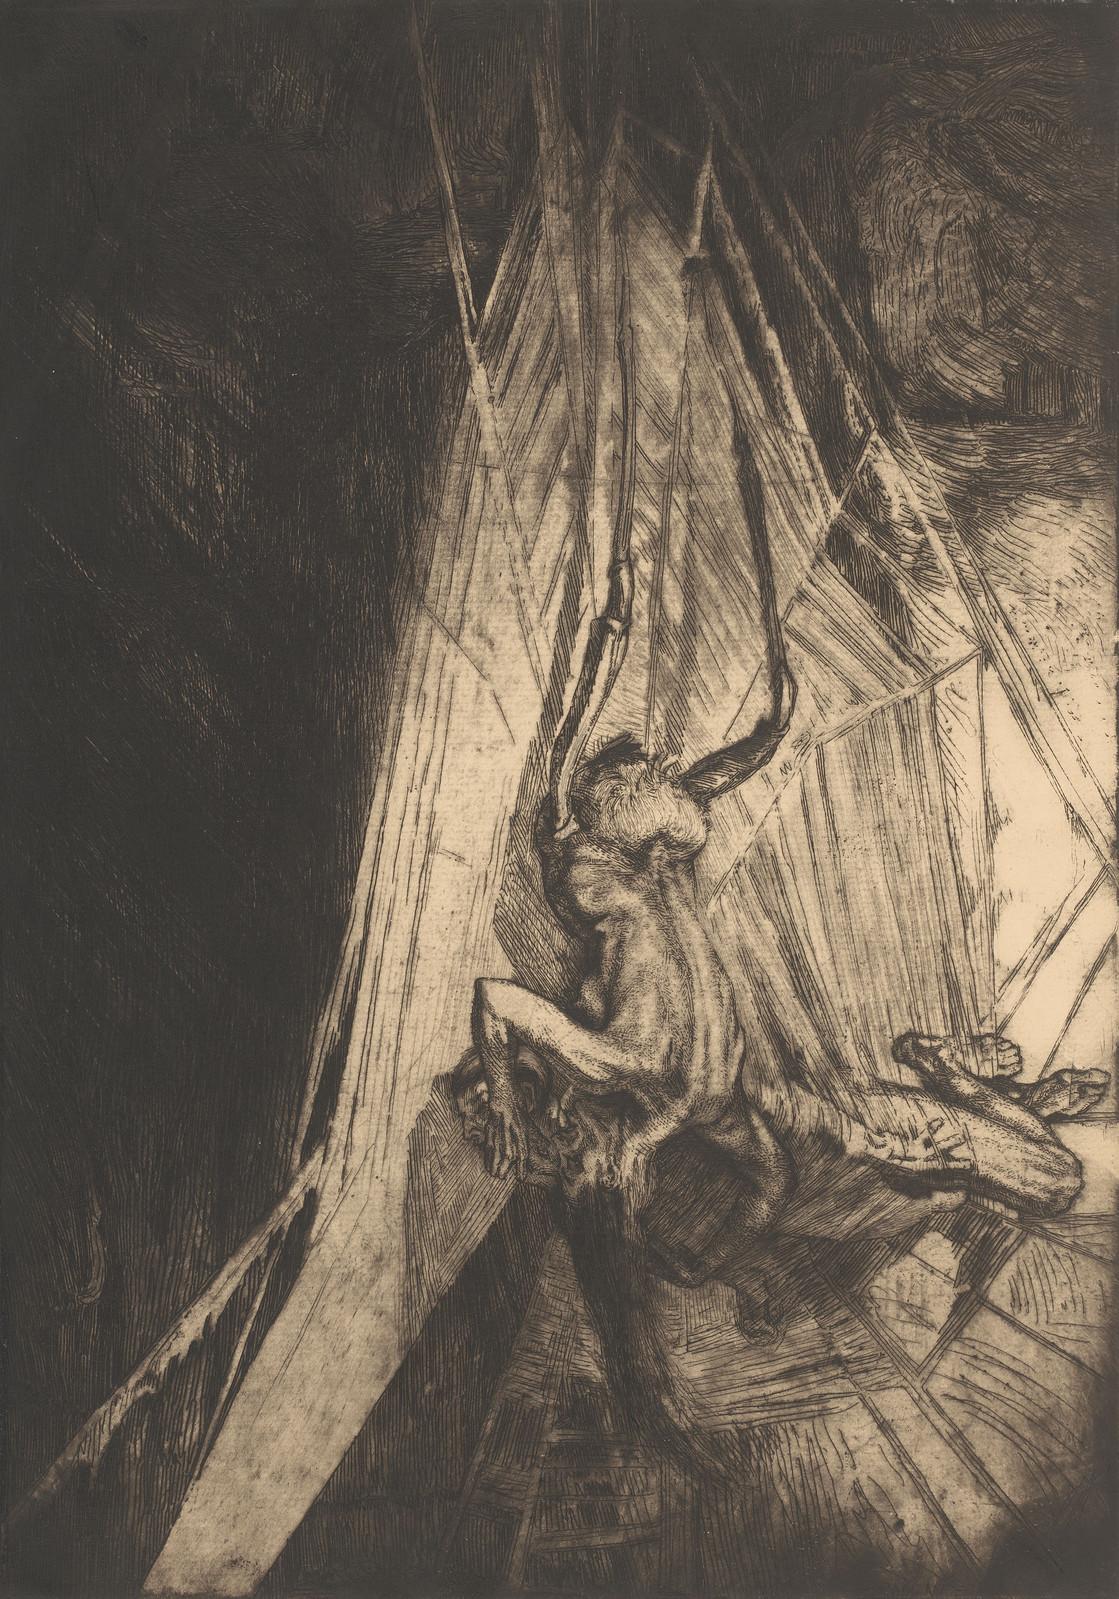 Marcel Roux - The Spider, 1910, Version 2